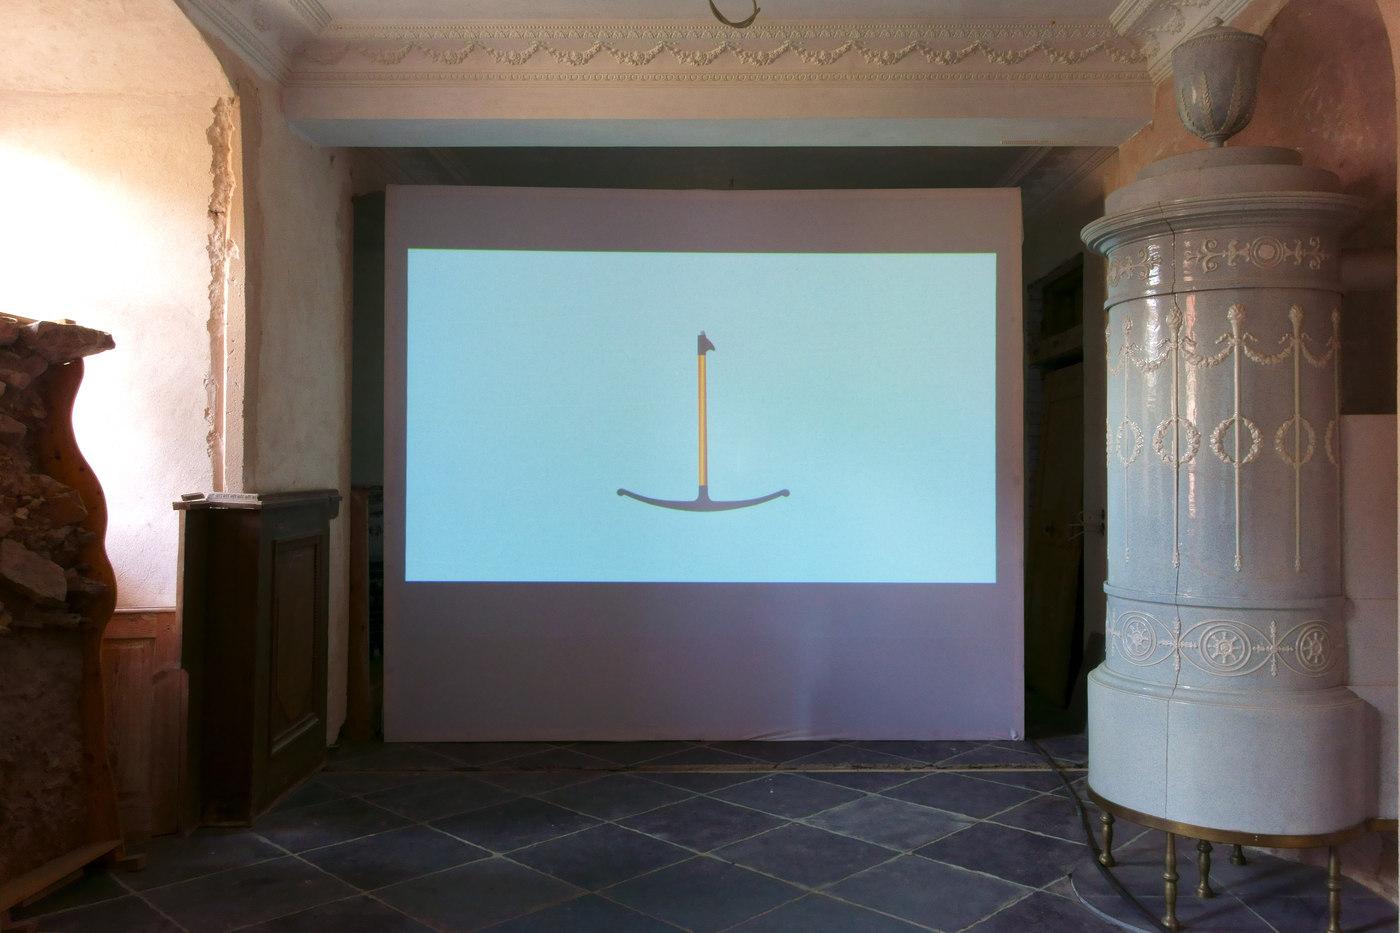 Kunstverein Wiesen_KuWi_Forward to History_Jan Kiefer & Robert Brambora_2016_JK_Room1_b